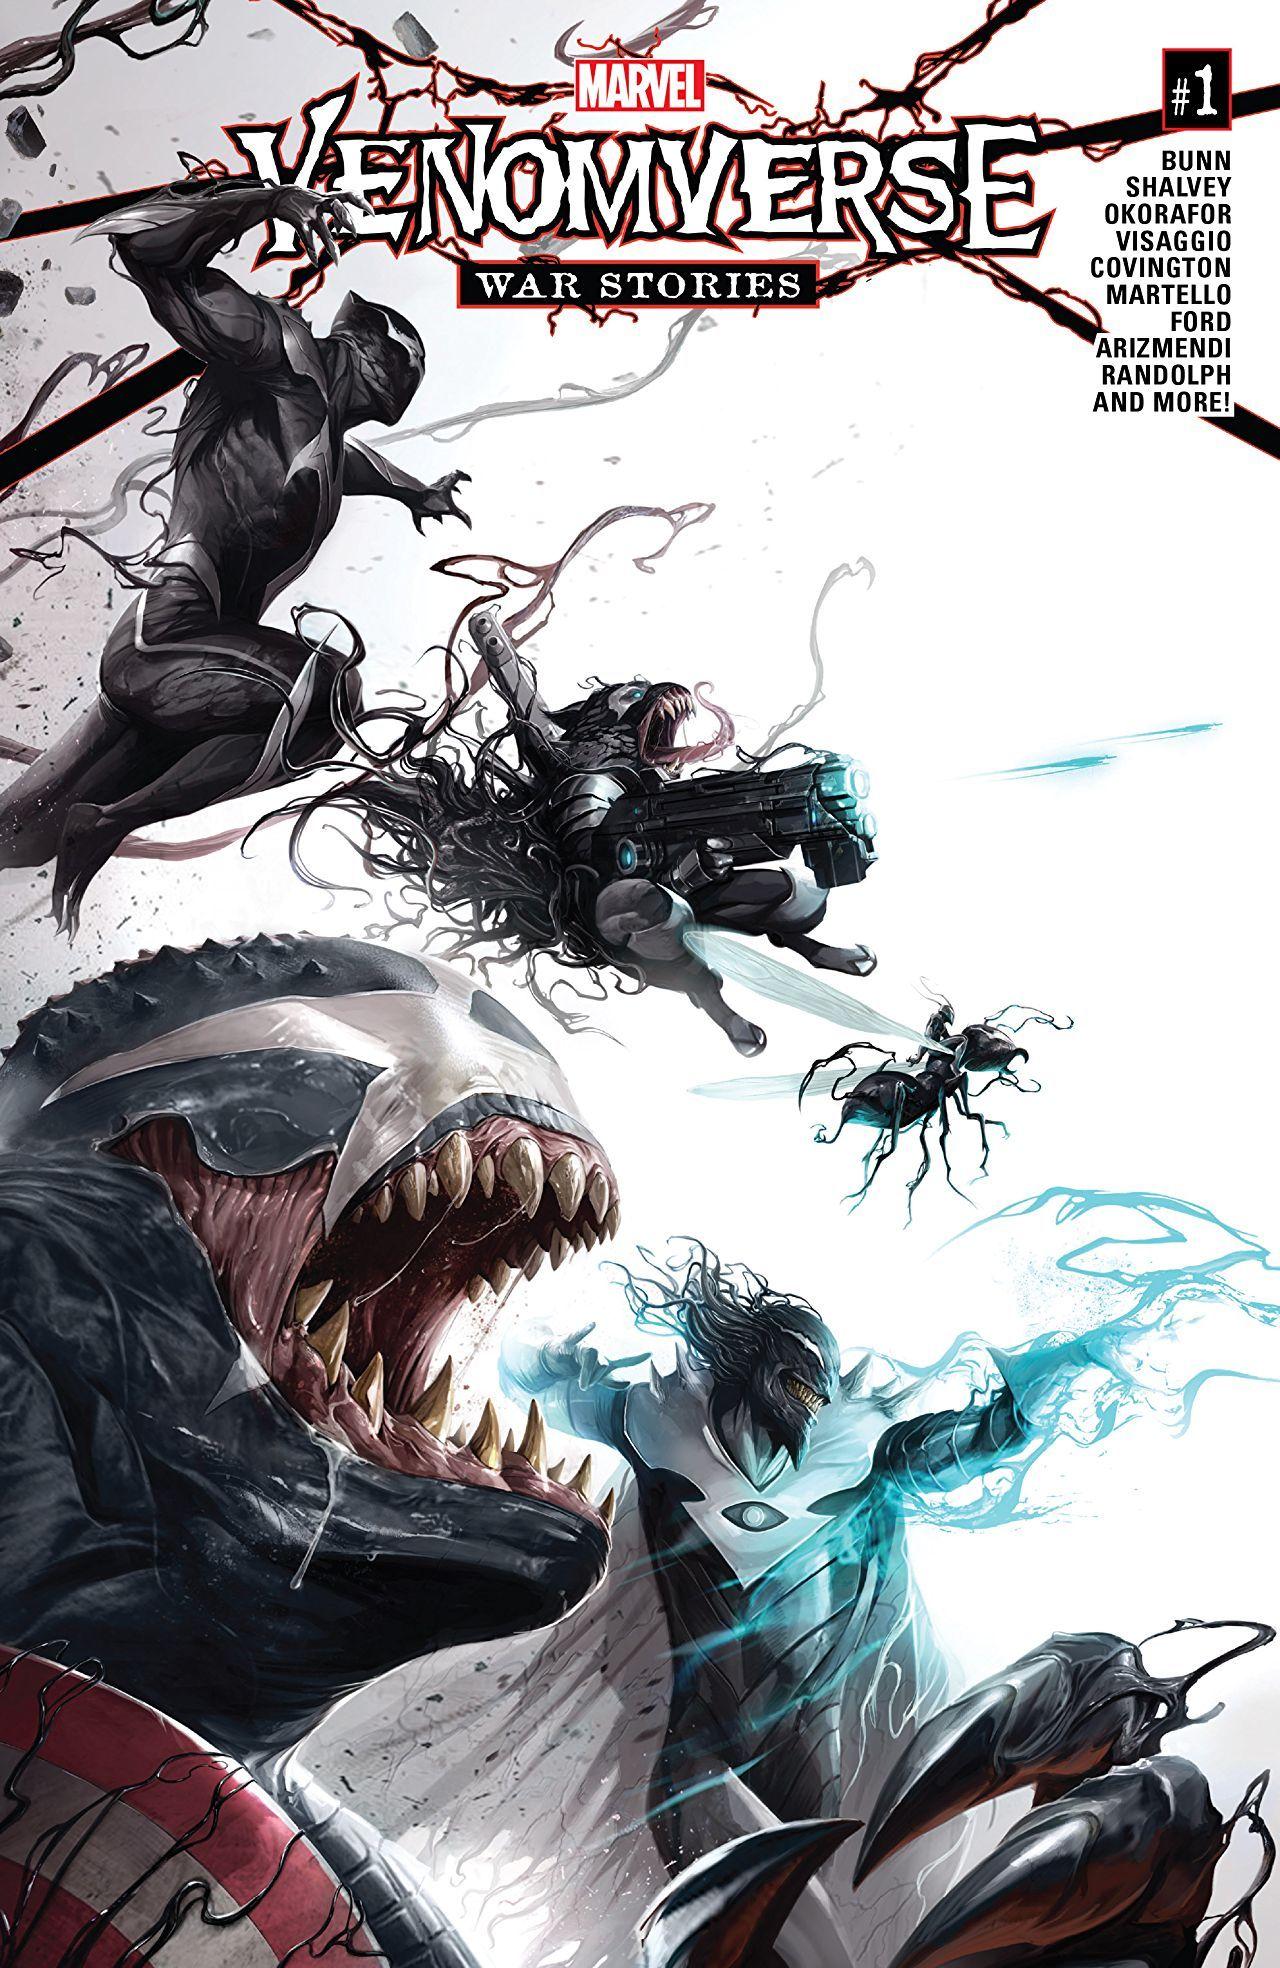 Edge of Venomverse War Stories 1 Marvel comics art